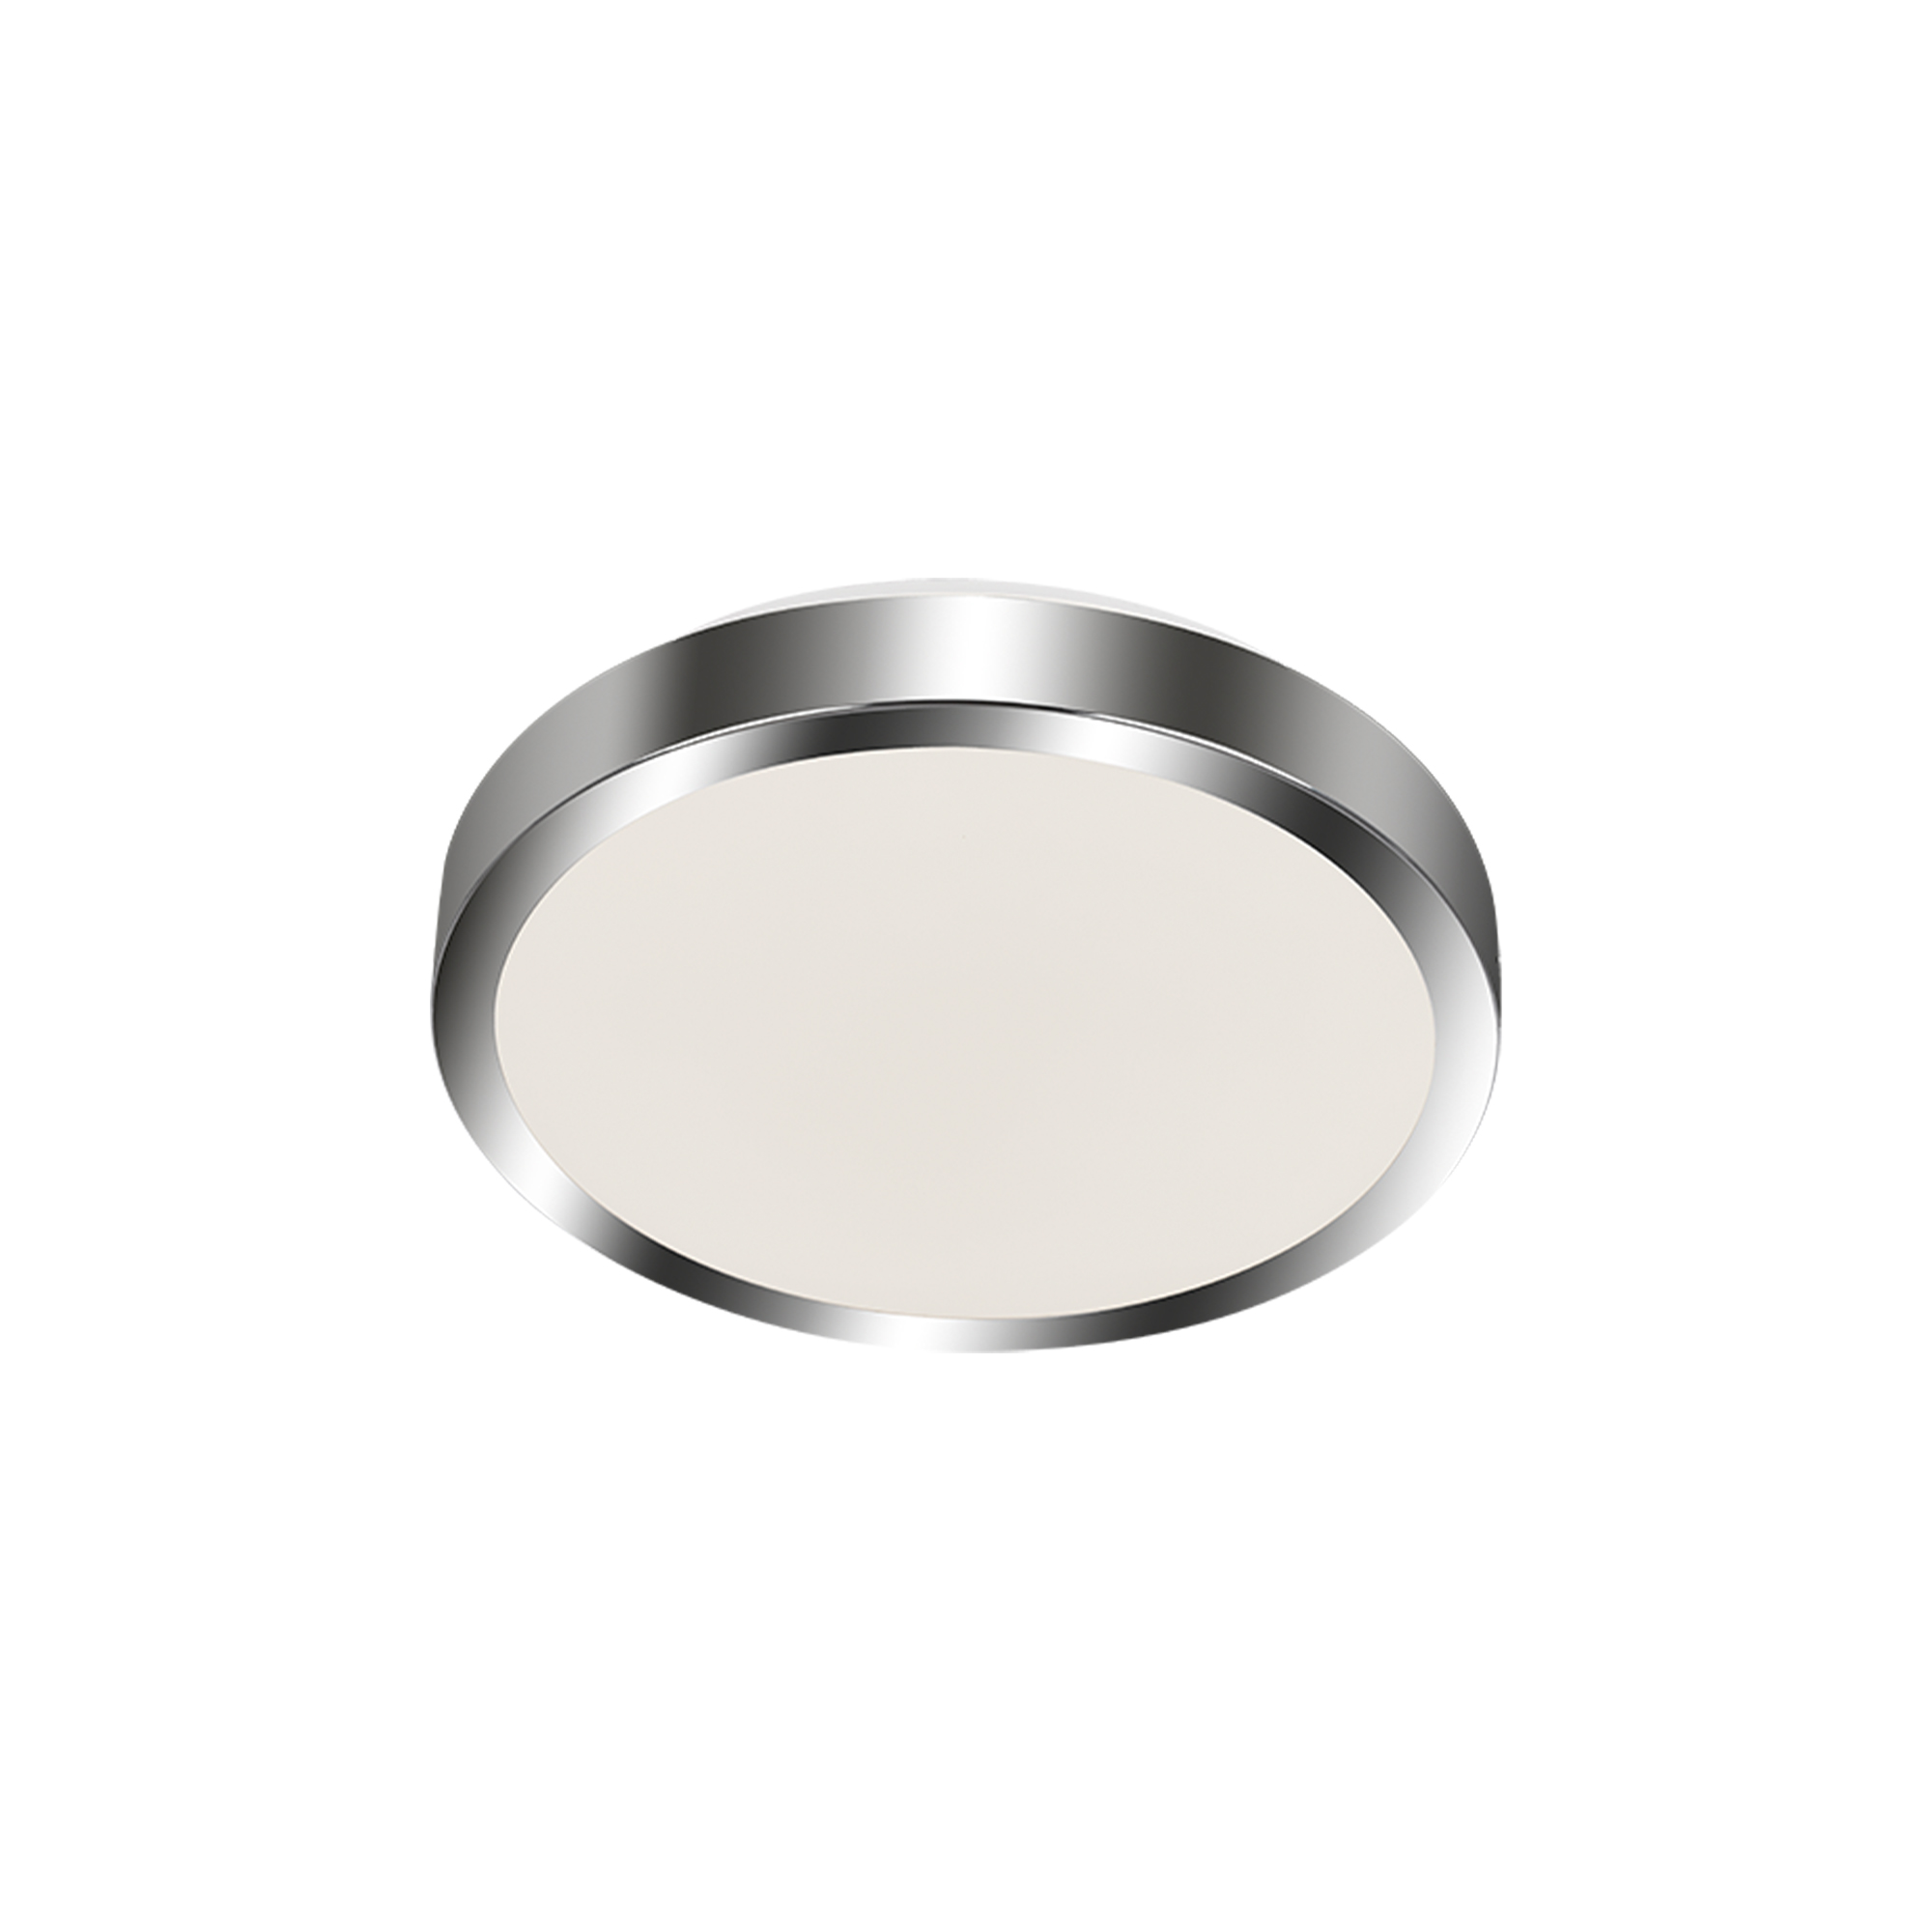 LED Deckenleuchte, Ø 29 cm, 15 W, Weiß-Chrom